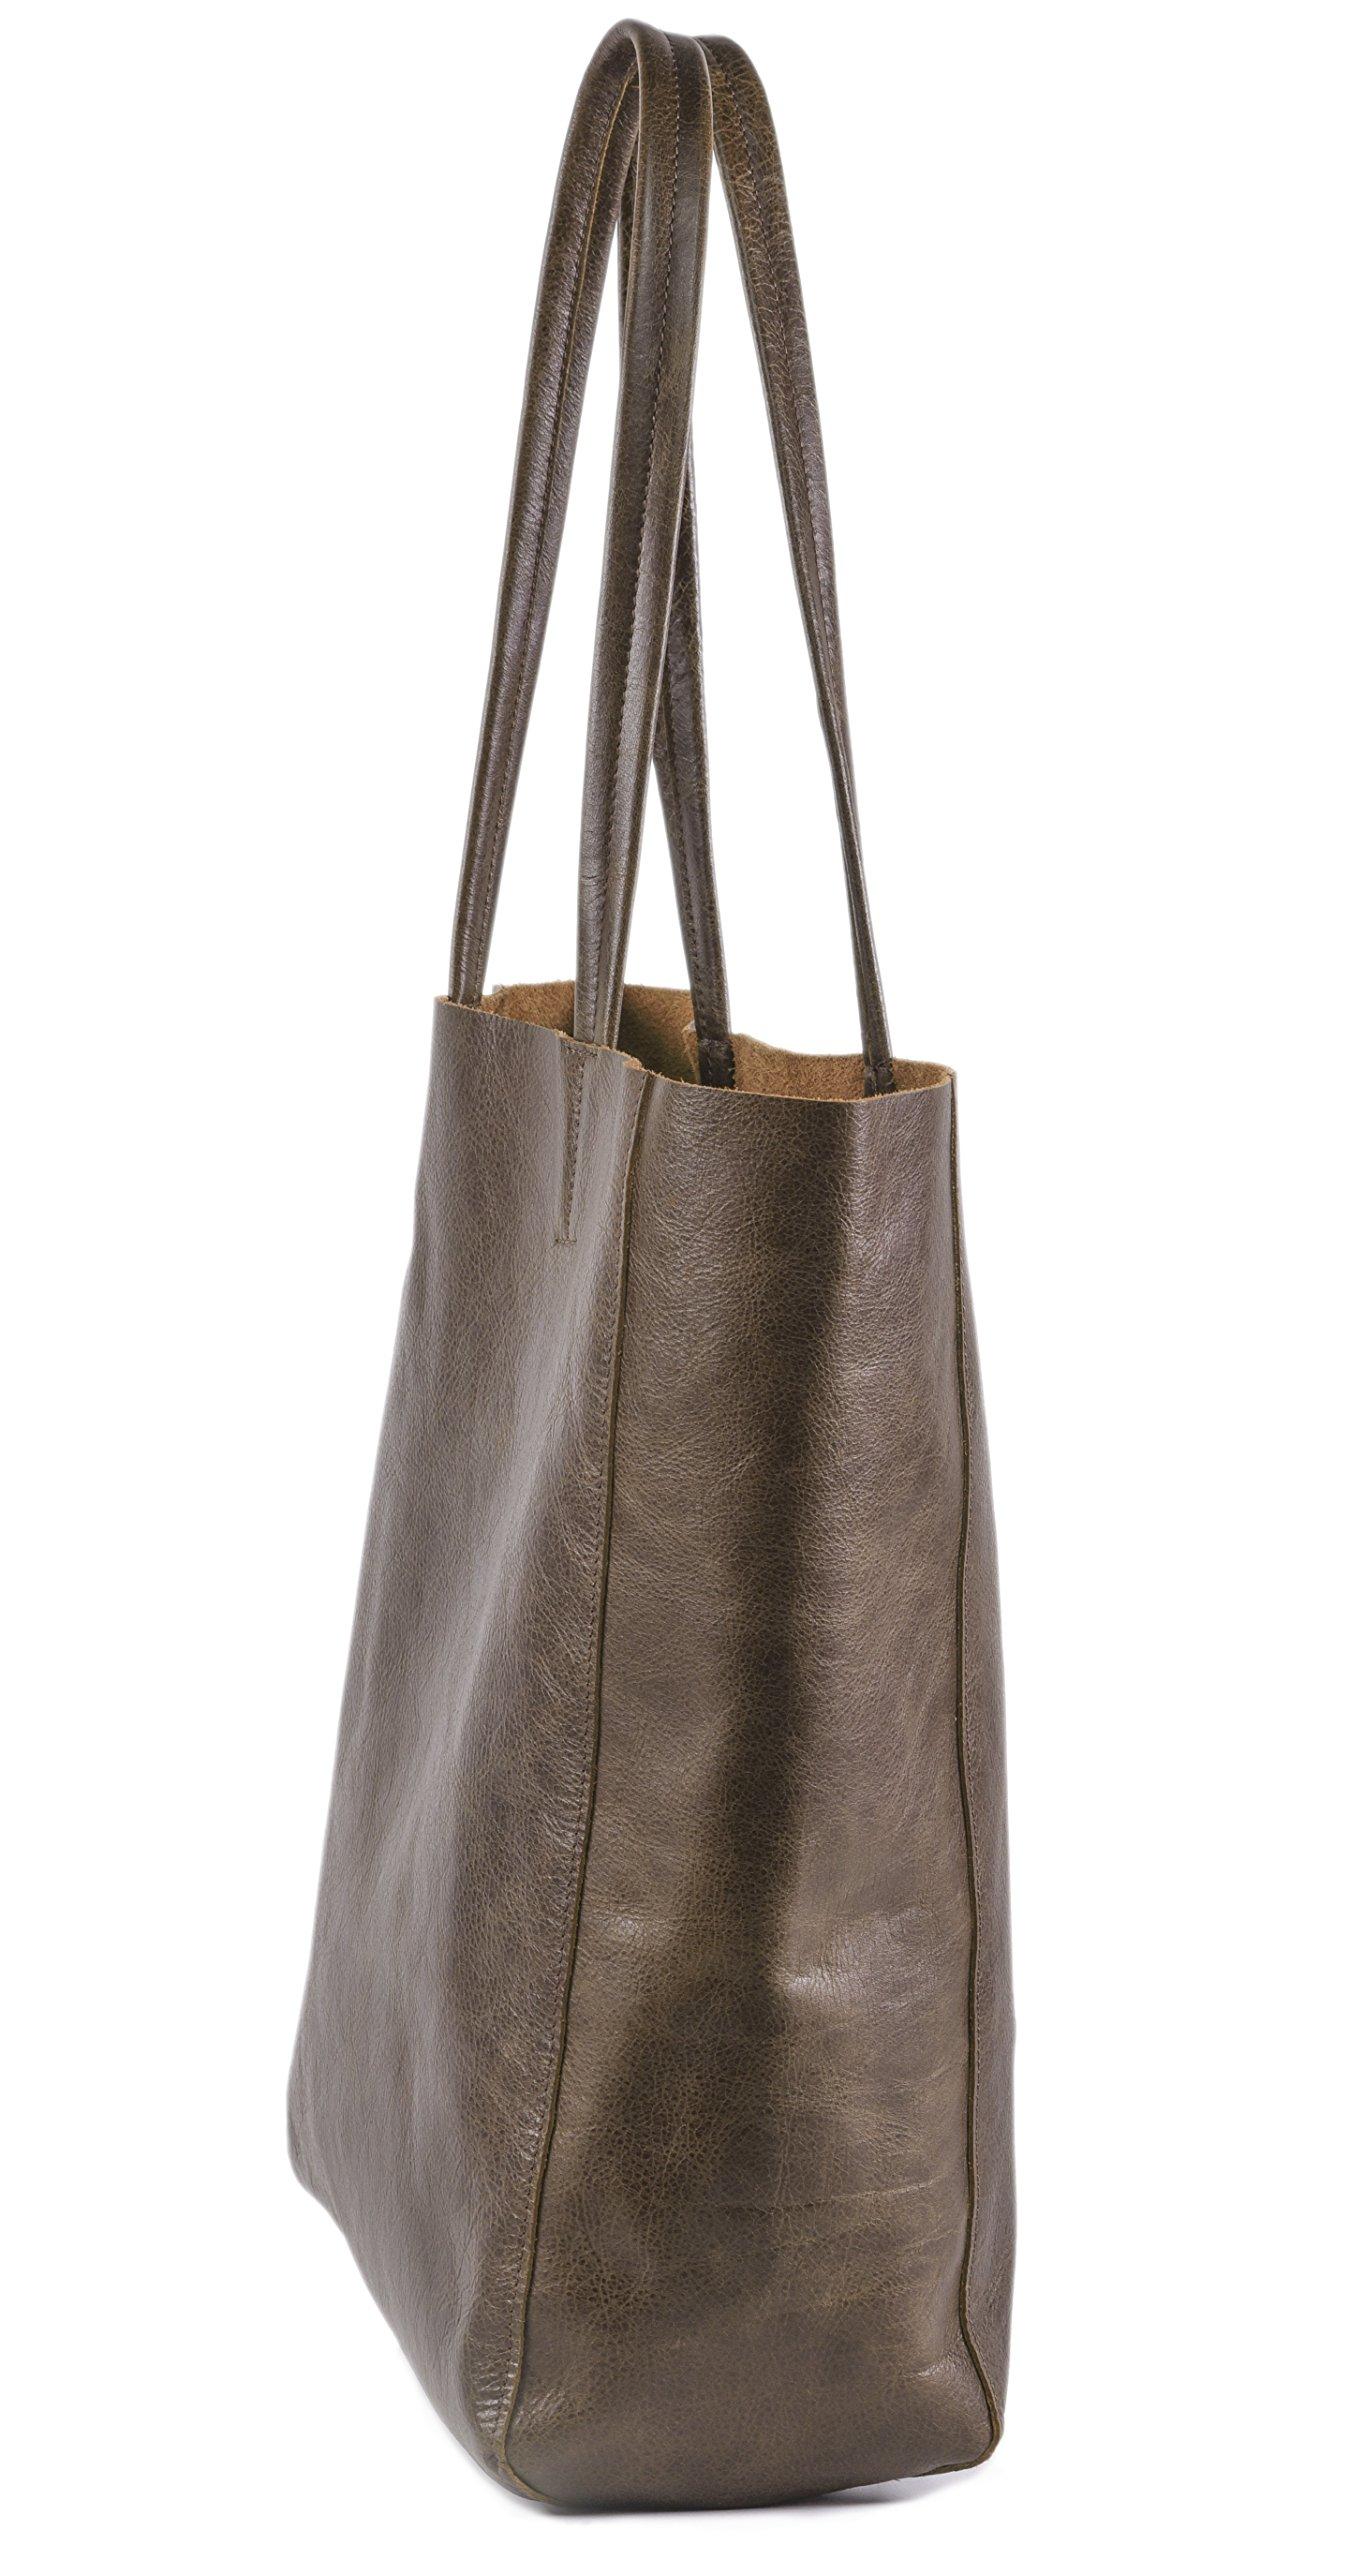 Women's Vintage Genuine Leather Tote Shoulder Bag - Large Capacity Travel Handbag by THE AARTISAN (Image #3)